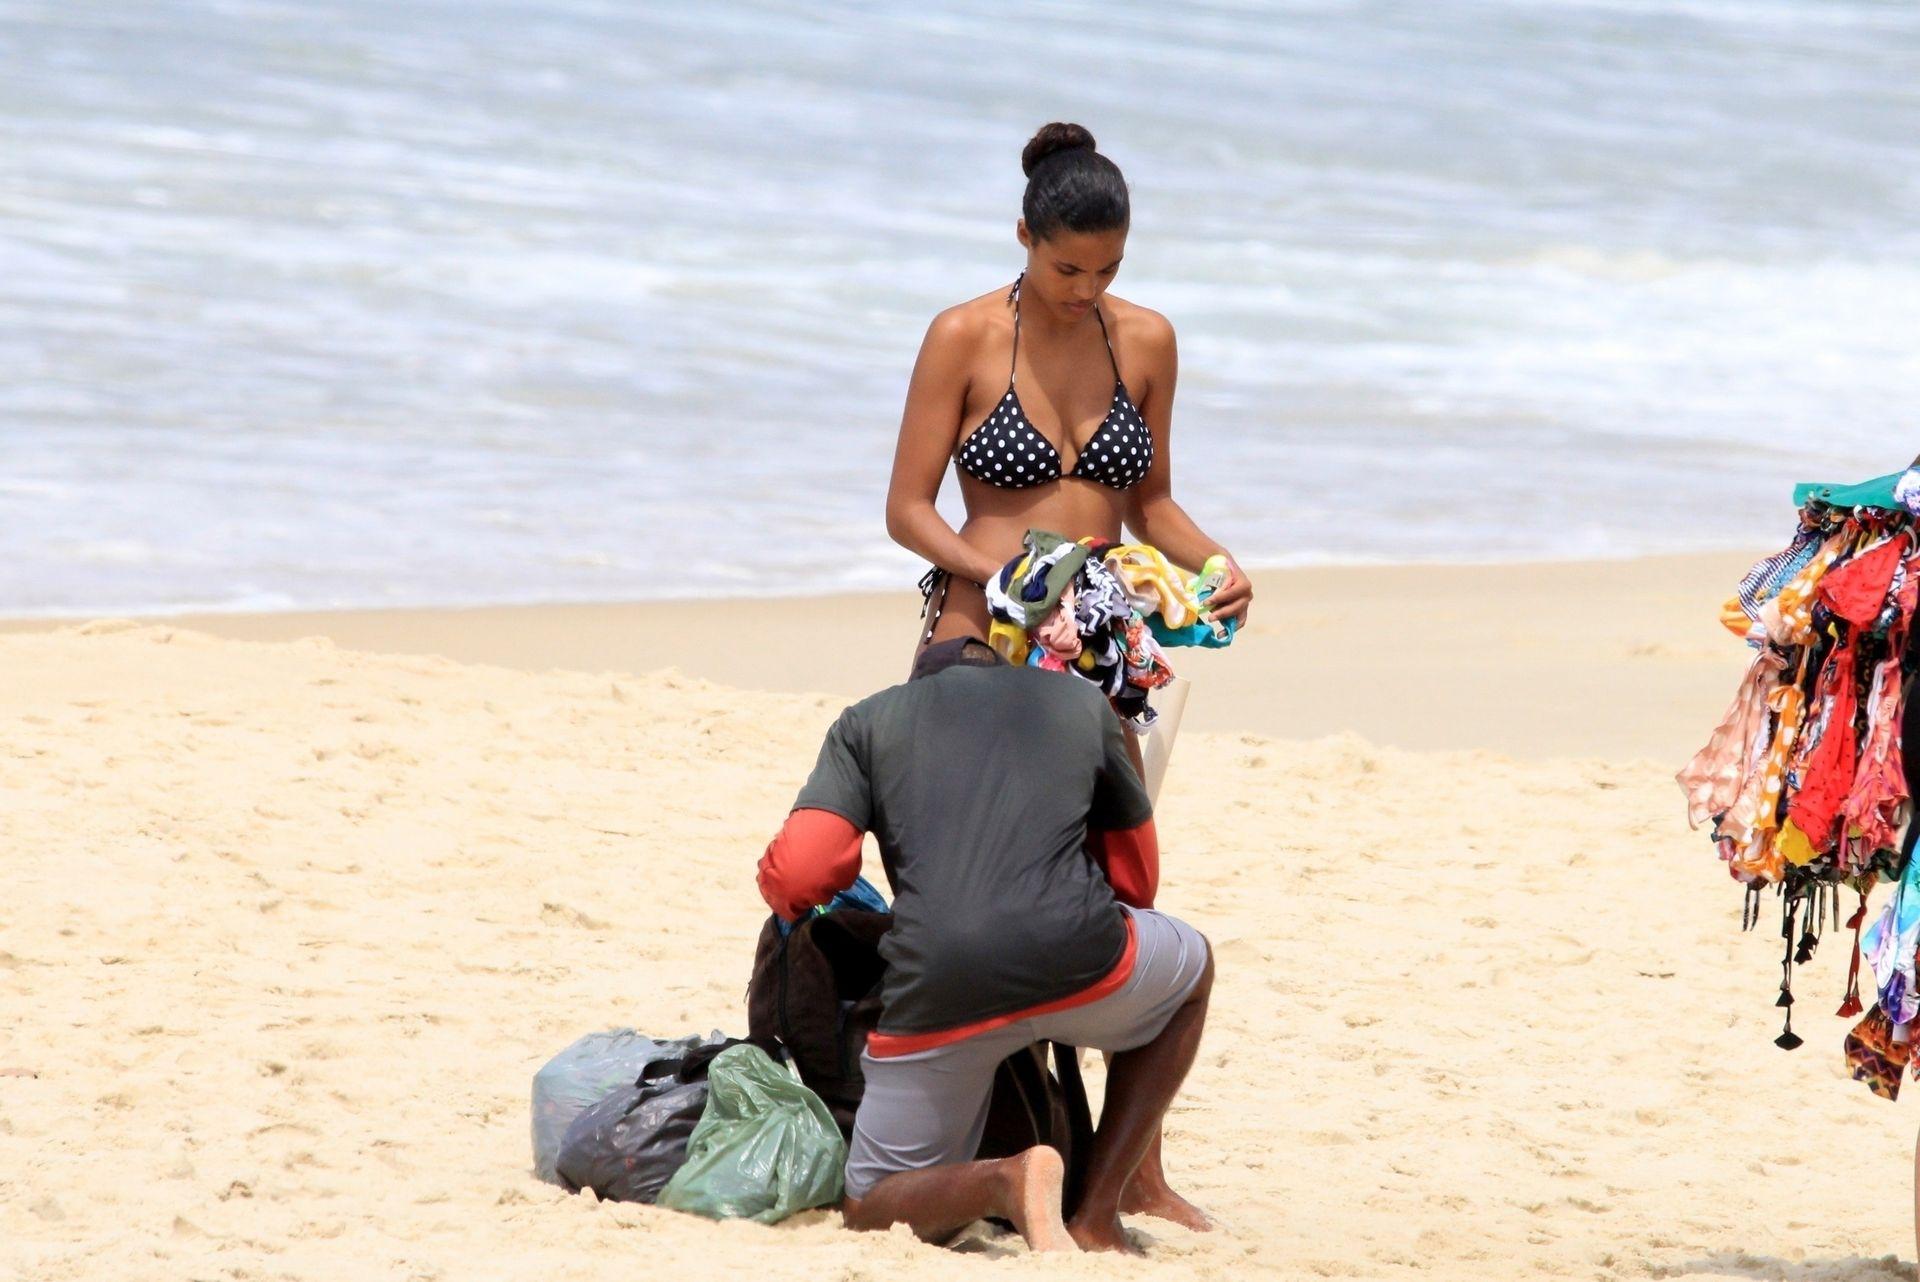 Tina Kunakey Nearly Nip Slip While Frolicking On The Beach In Rio 0059